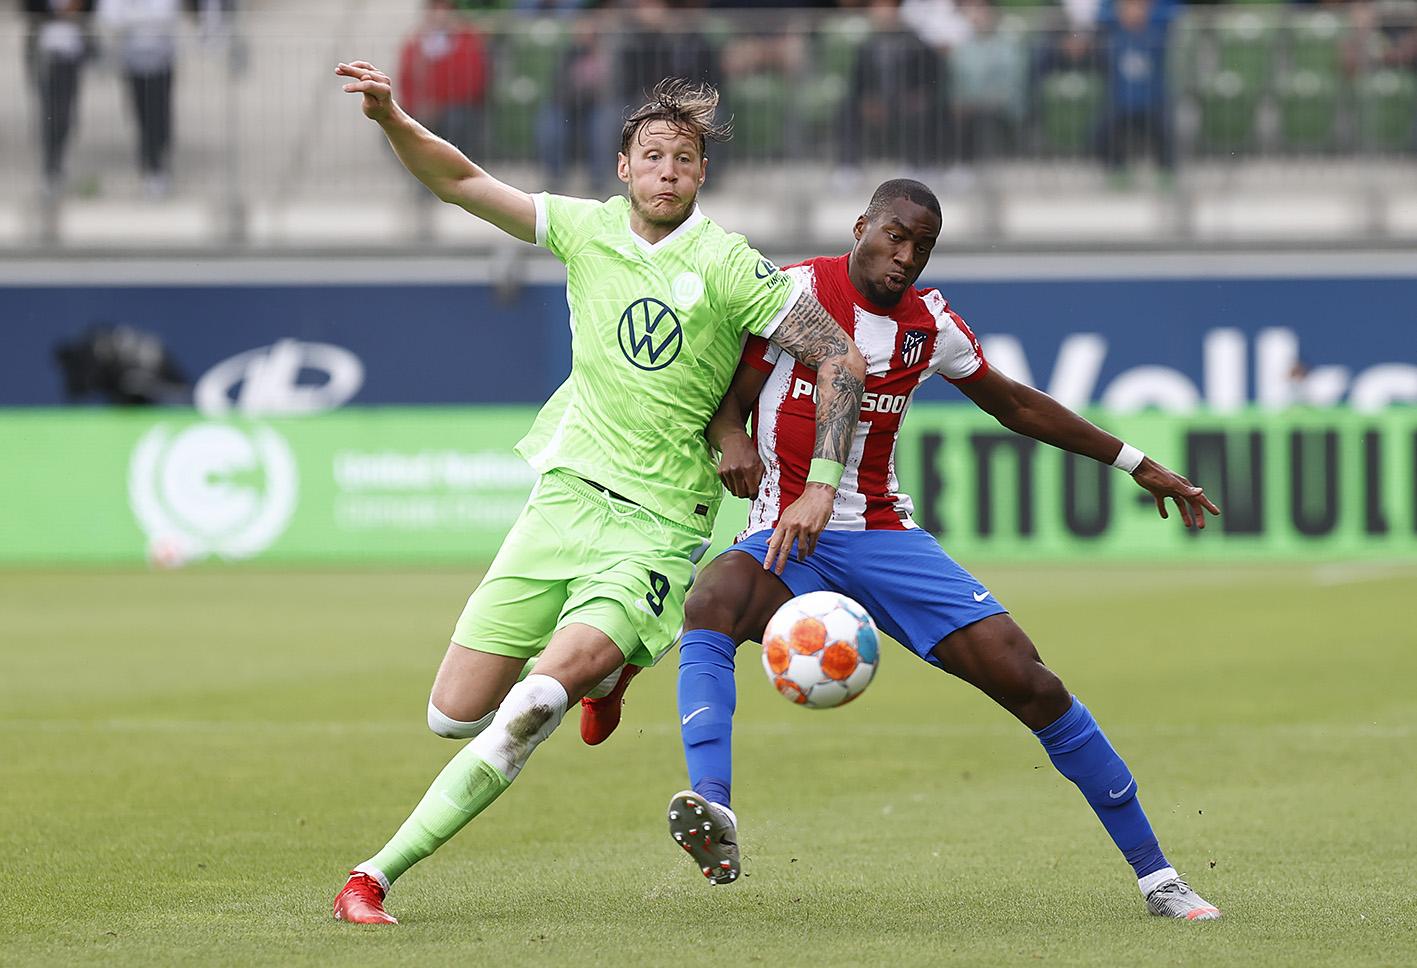 Atletico Madrid battle back to secure 2-1 preseason win at Wolfsburg